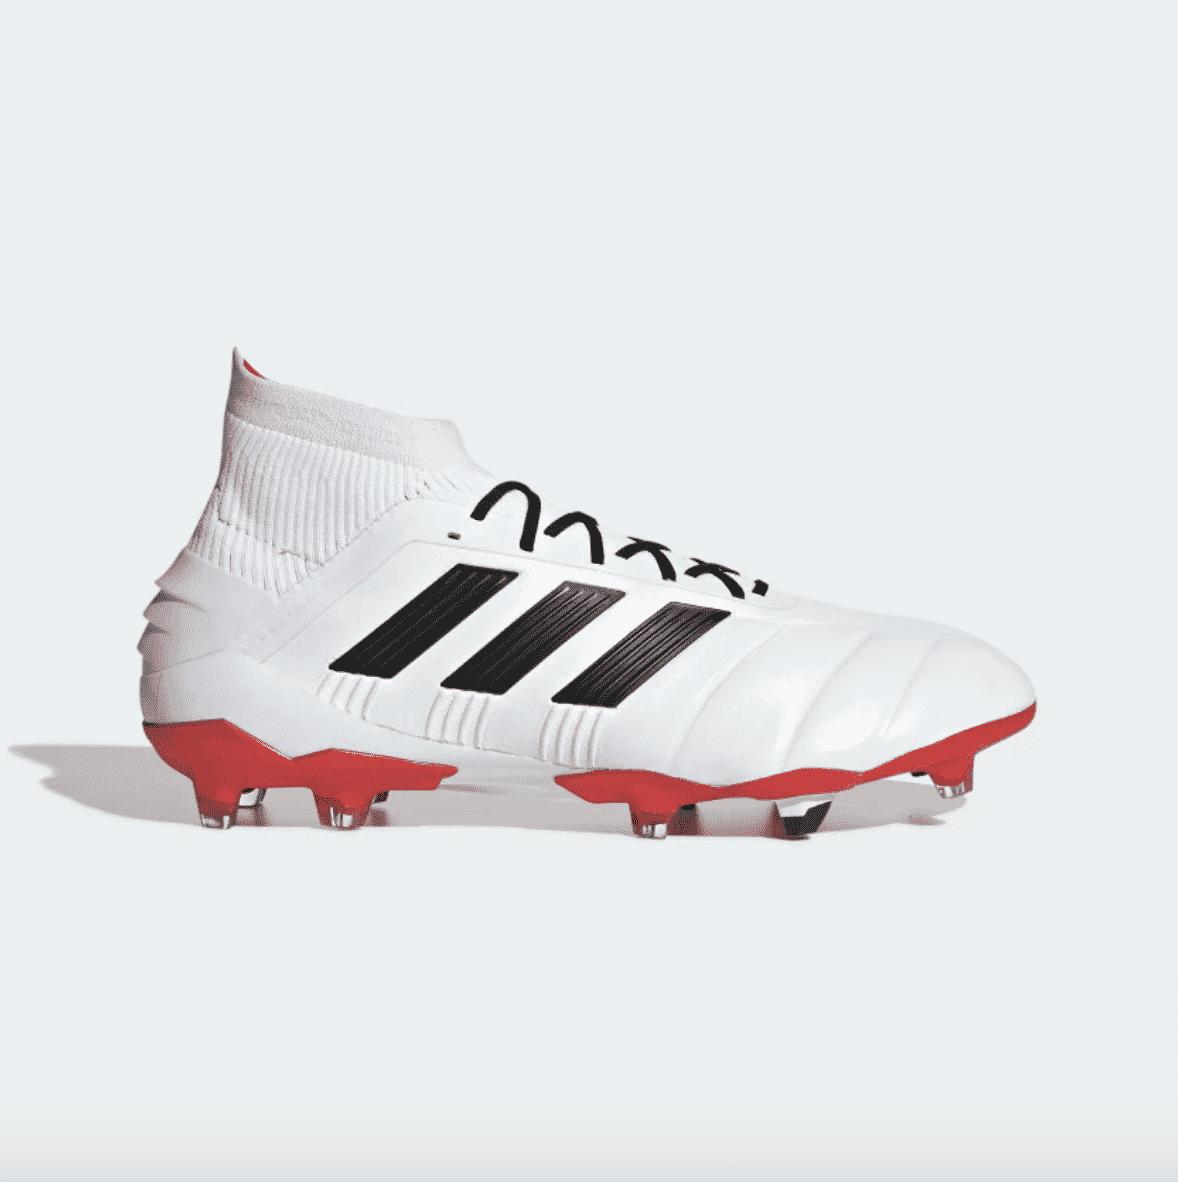 adidas-predator-19.1-reedition-predator-mania-blanc-1